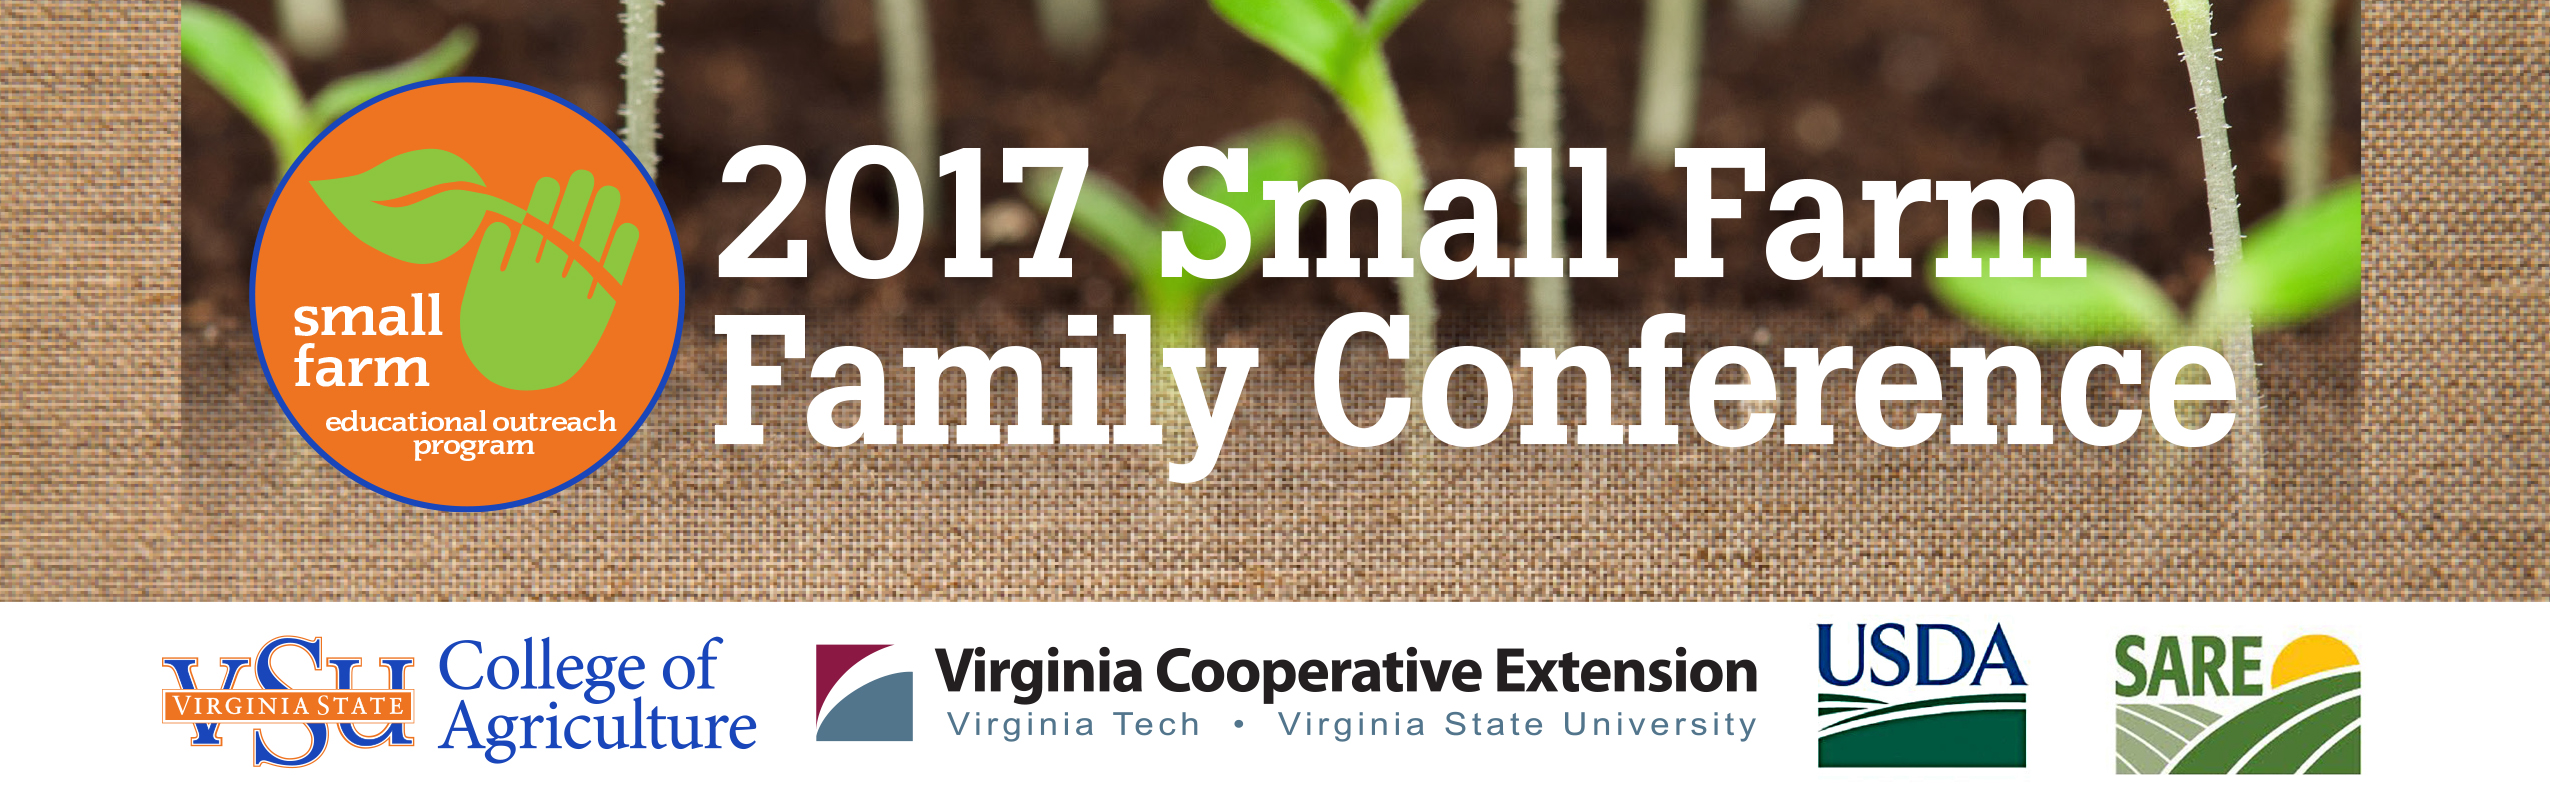 small farm family conference